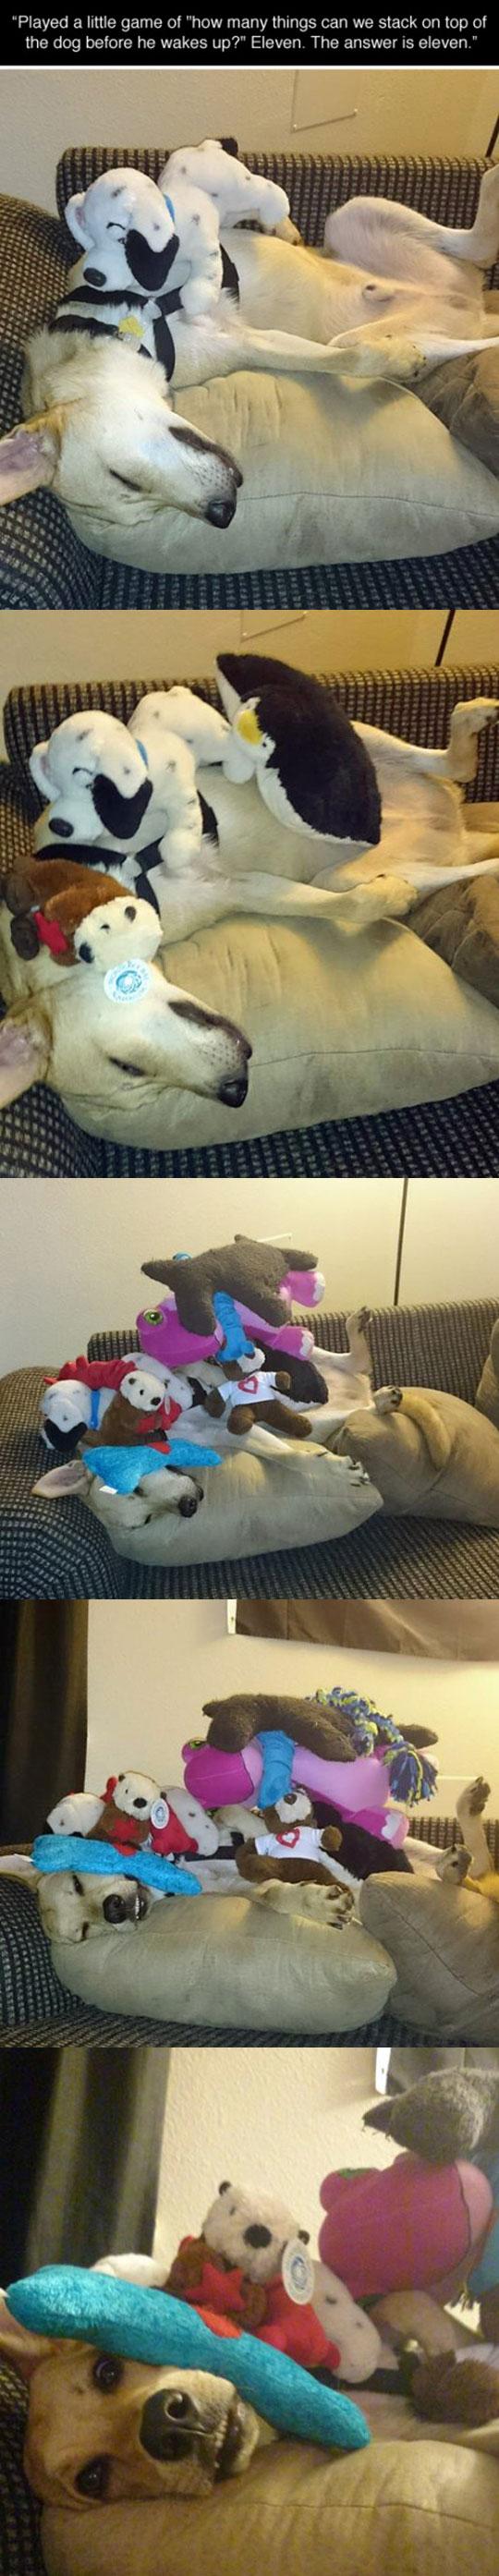 funny-dog-stacked-toys-sleeping